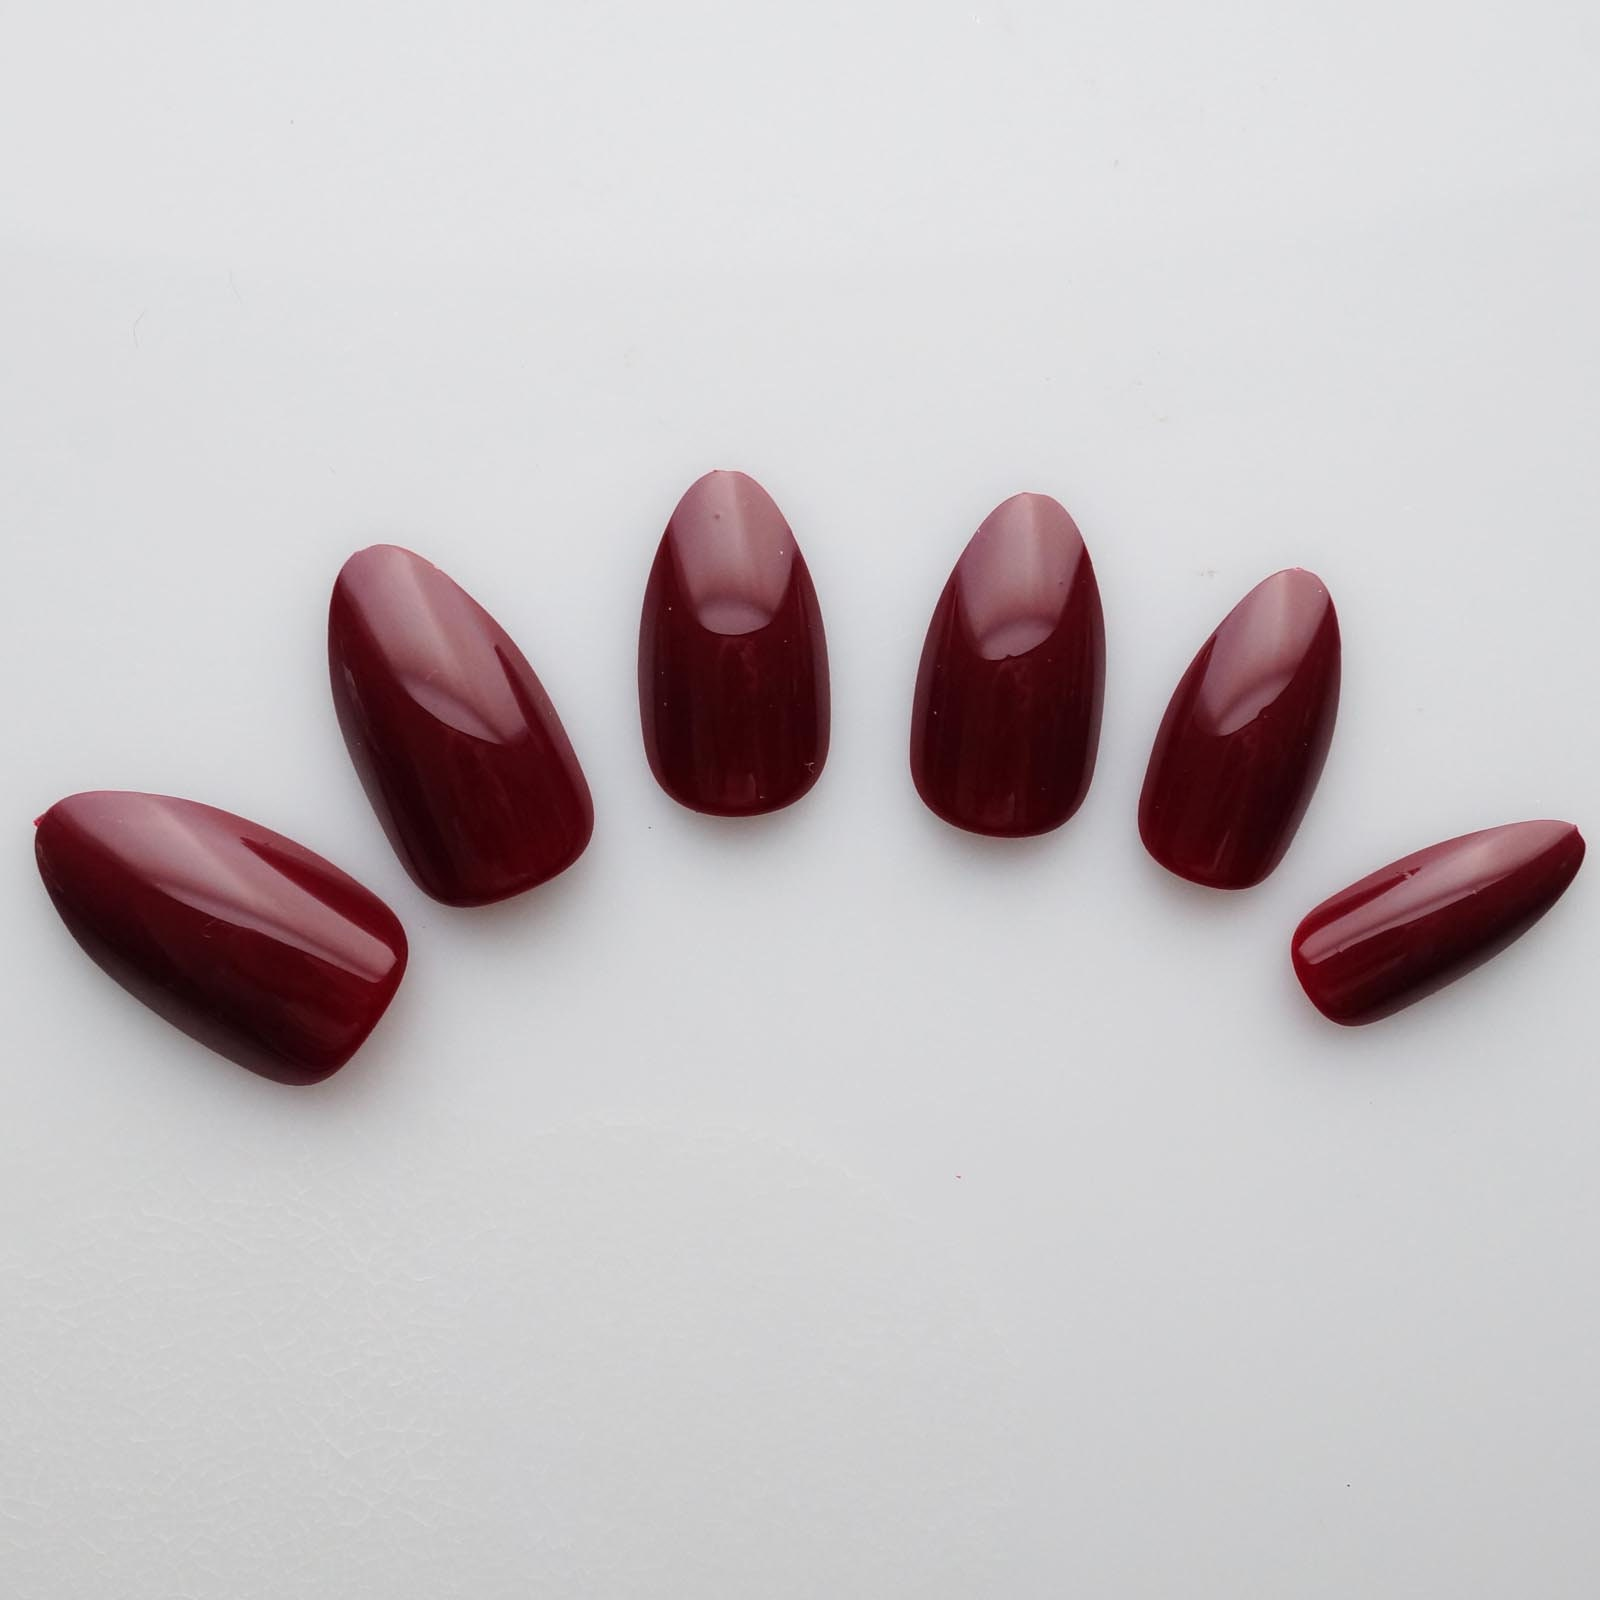 24 False Nails Color Nails Stiletto Nails High Quality